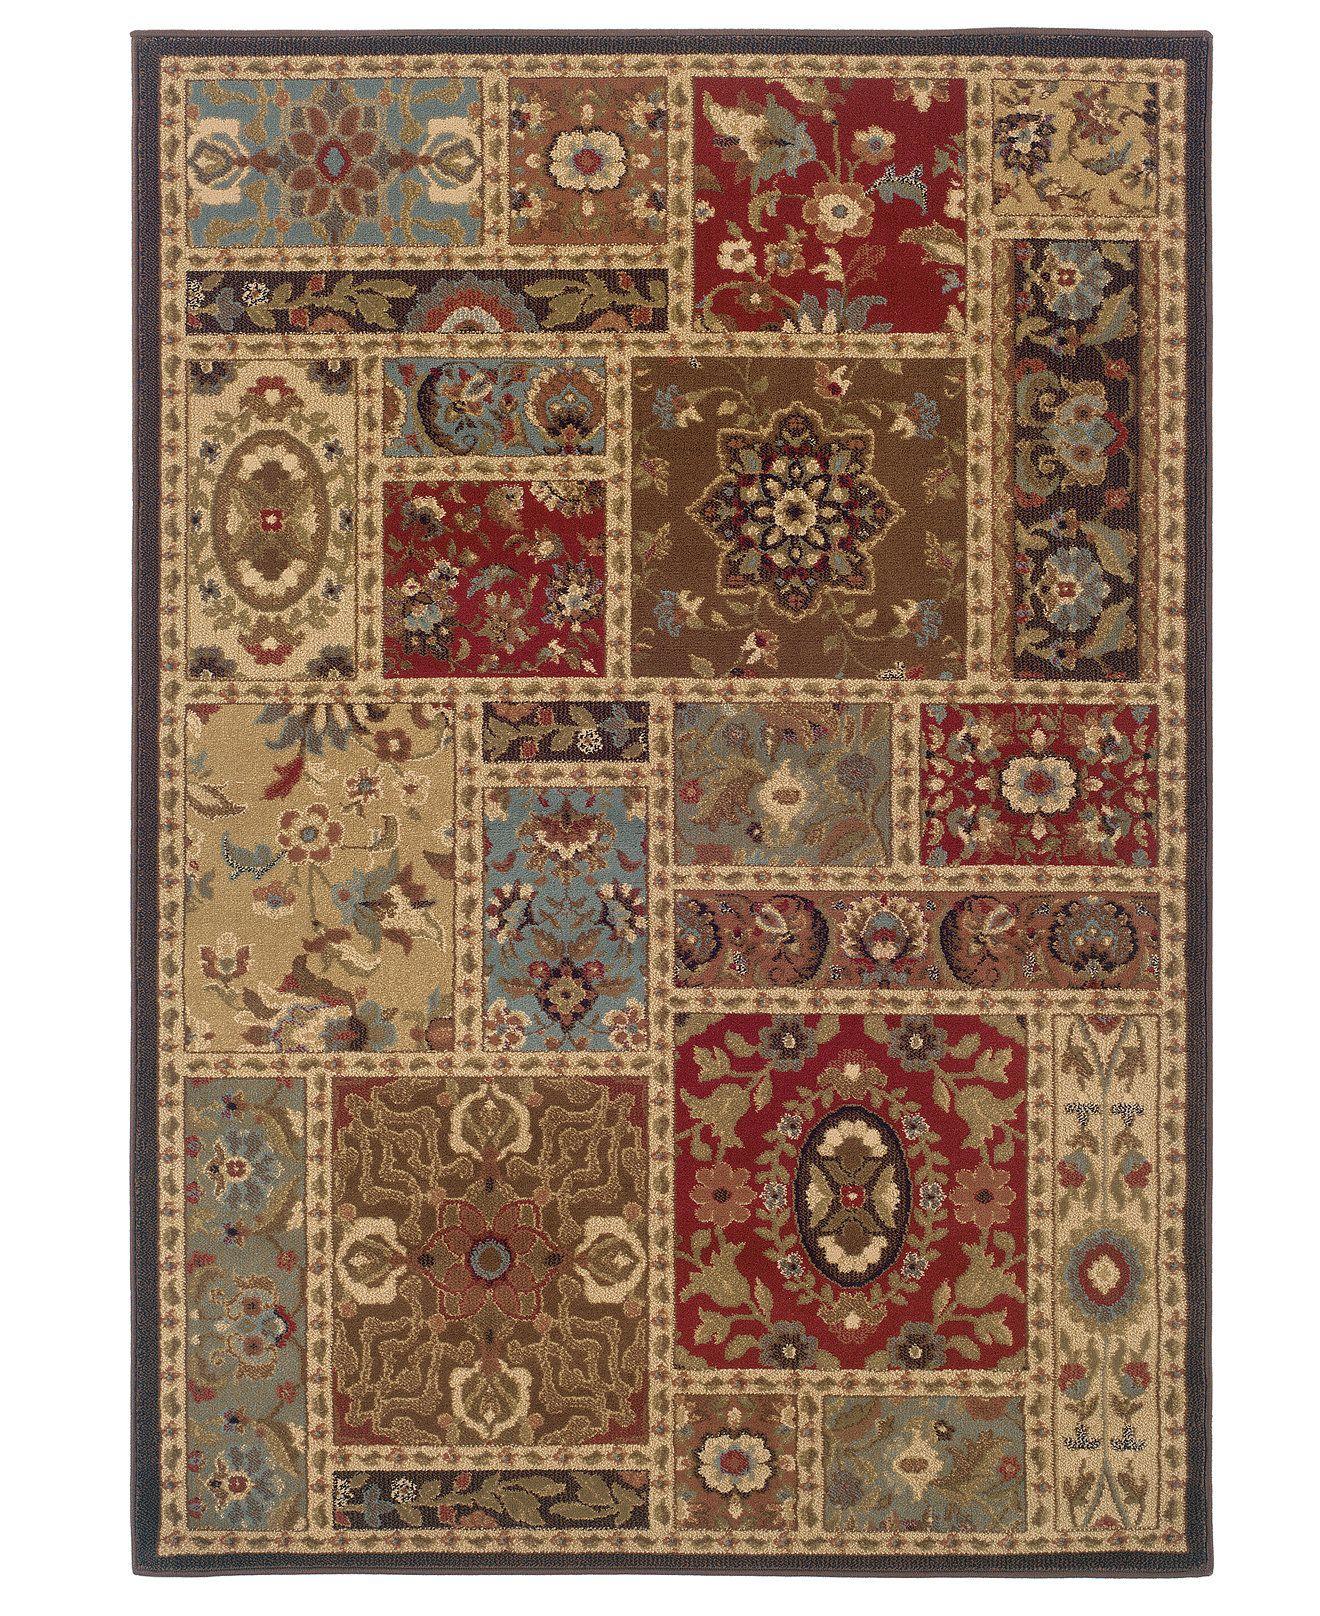 Oriental Weavers Area Rug Yorkville 1716c 2 X 7 6